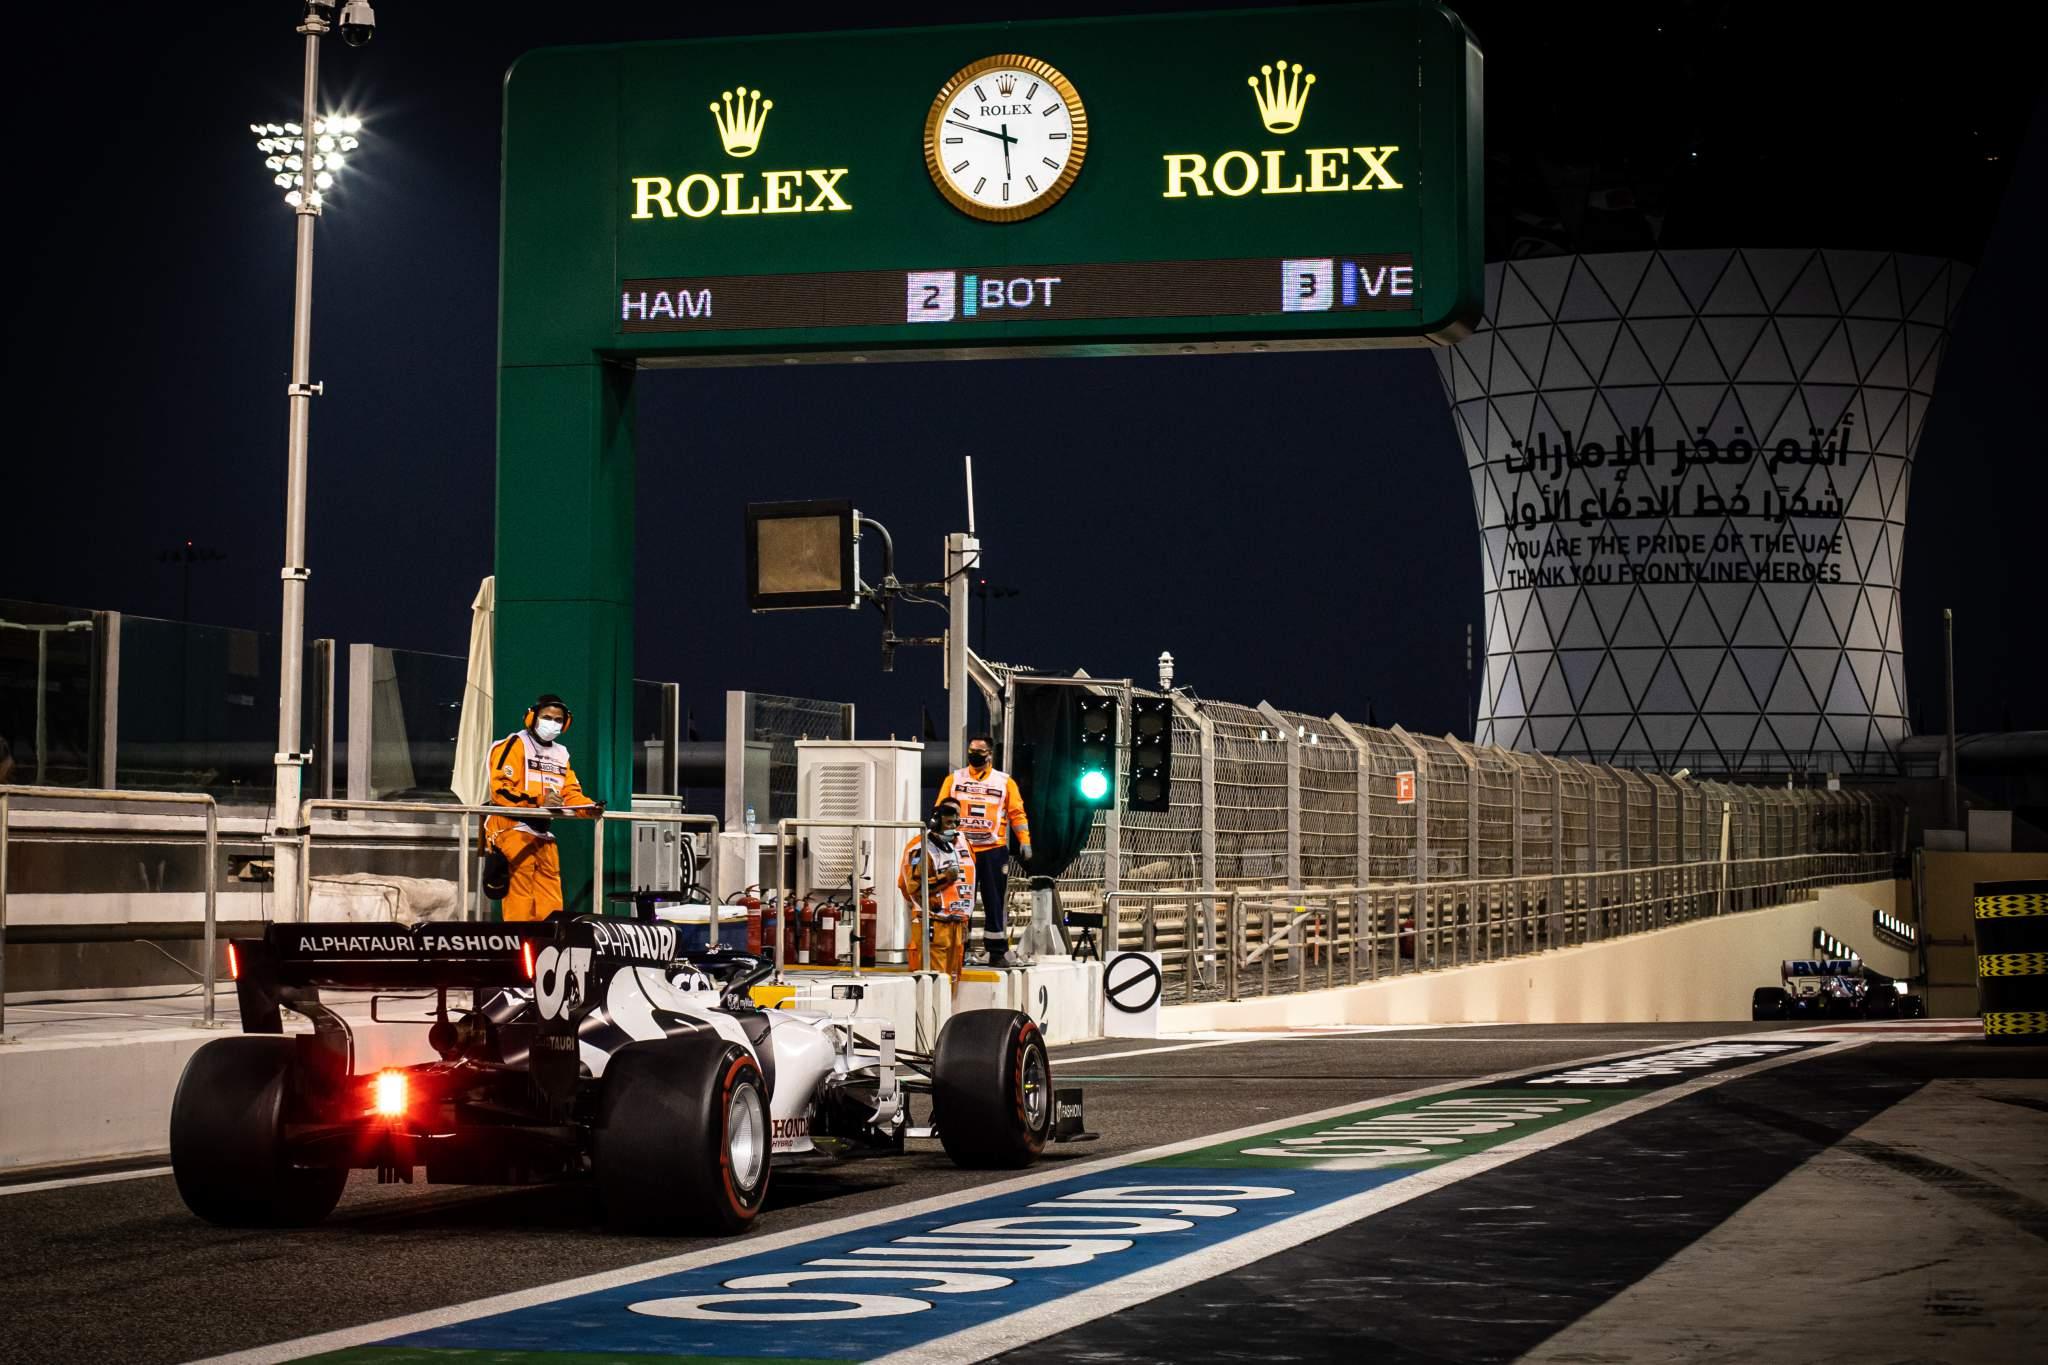 Daniil Kvyat AlphaTauri Abu Dhabi Grand Prix 2020